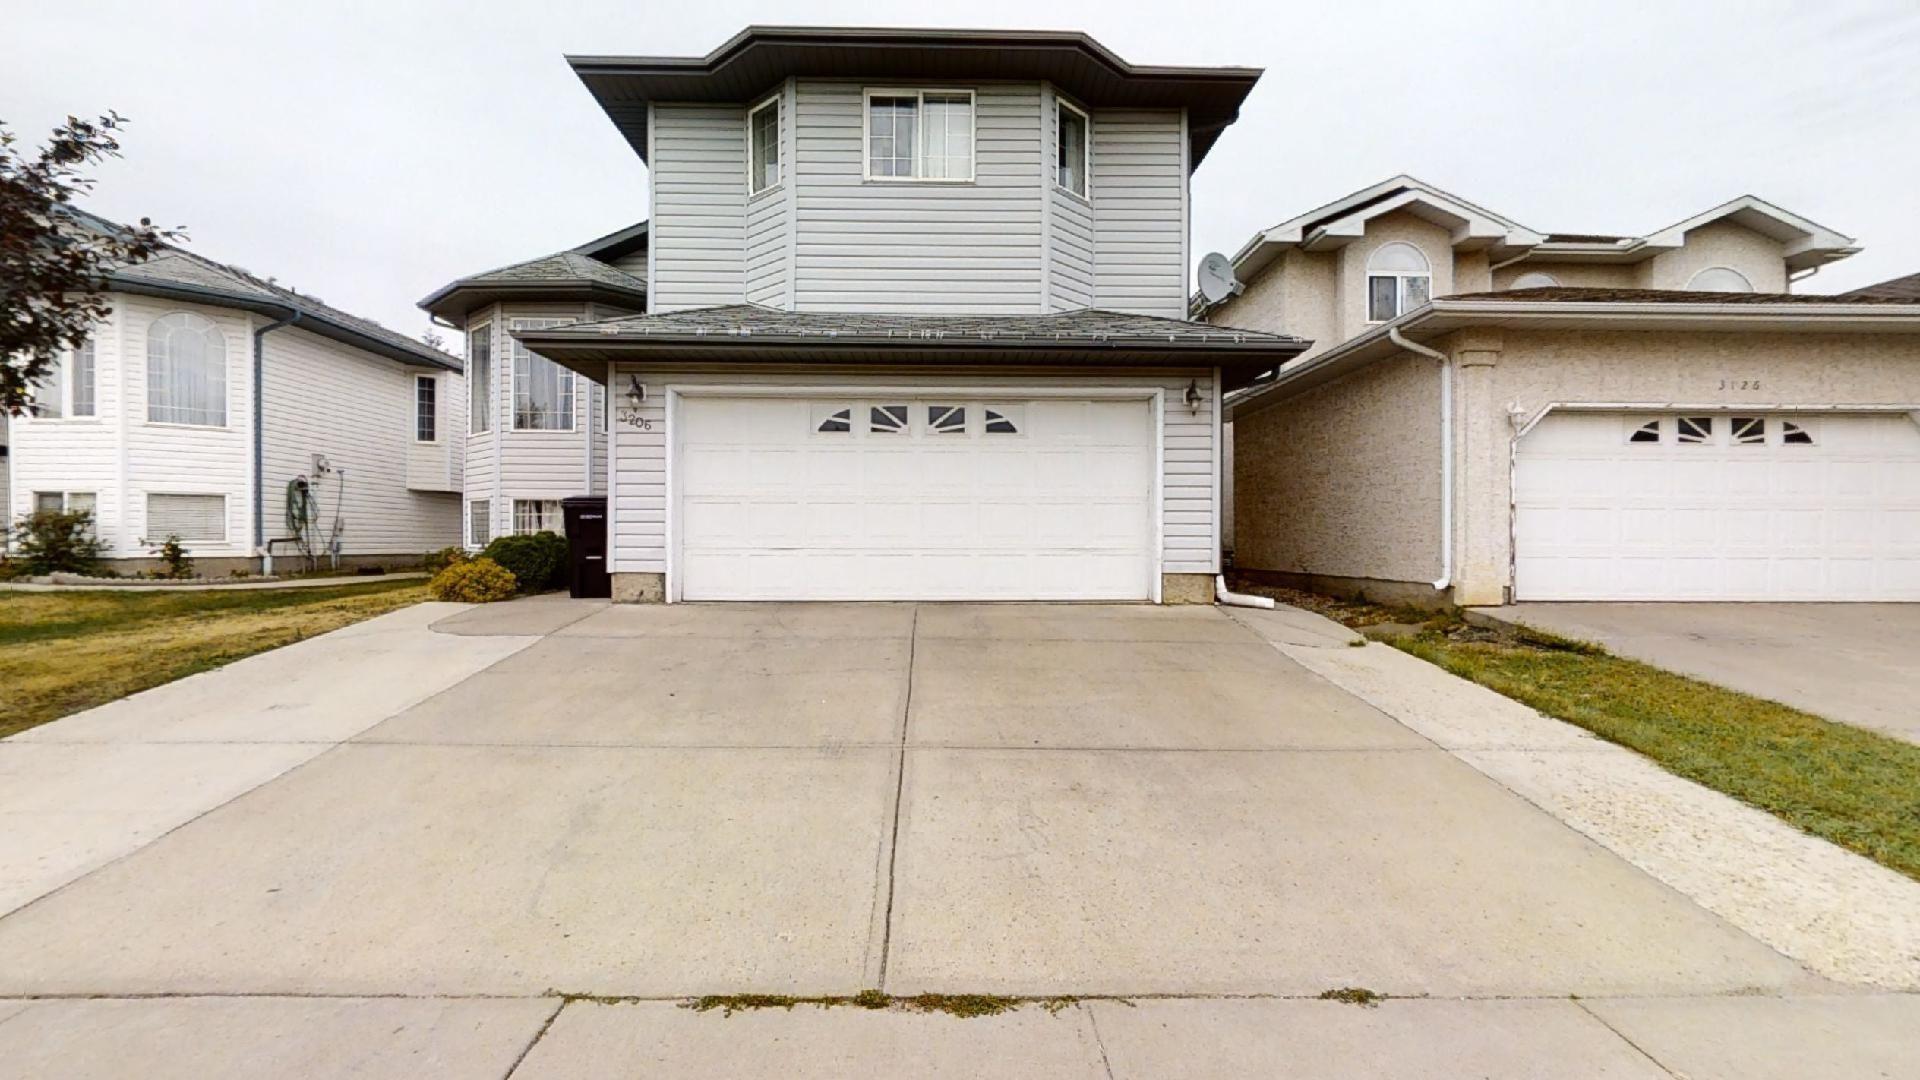 Main Photo: 3206 35A Avenue in Edmonton: Zone 30 House for sale : MLS®# E4259198